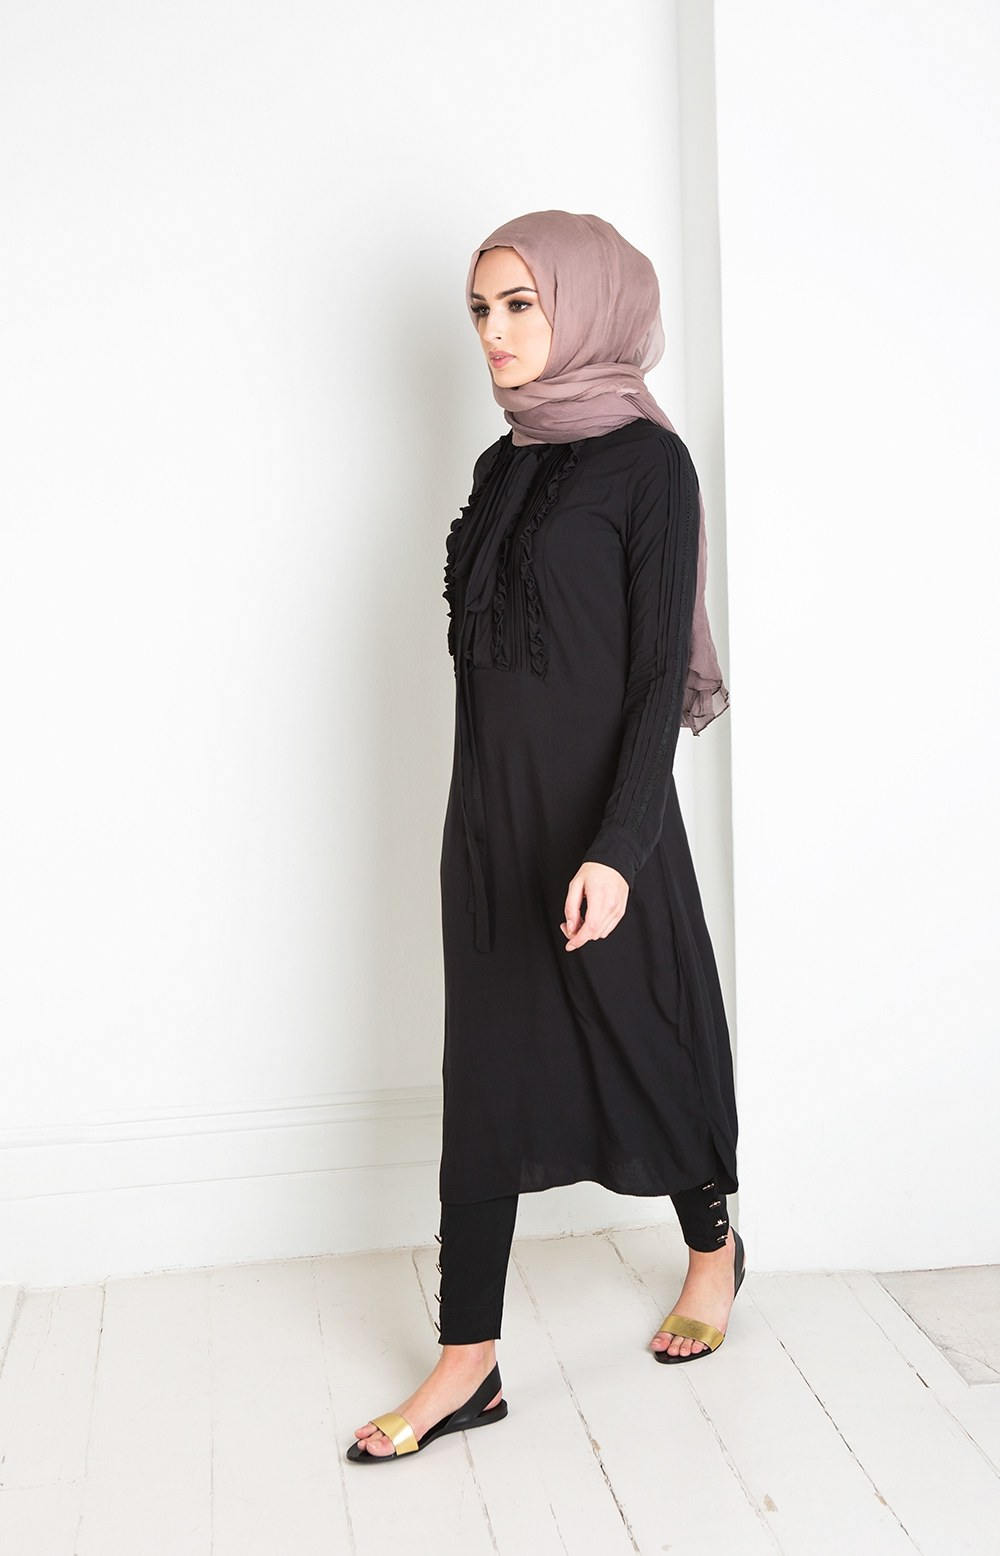 Bentuk Trend Baju Lebaran Wanita 2018 Xtd6 25 Trend Model Baju Muslim Lebaran 2018 Simple & Modis